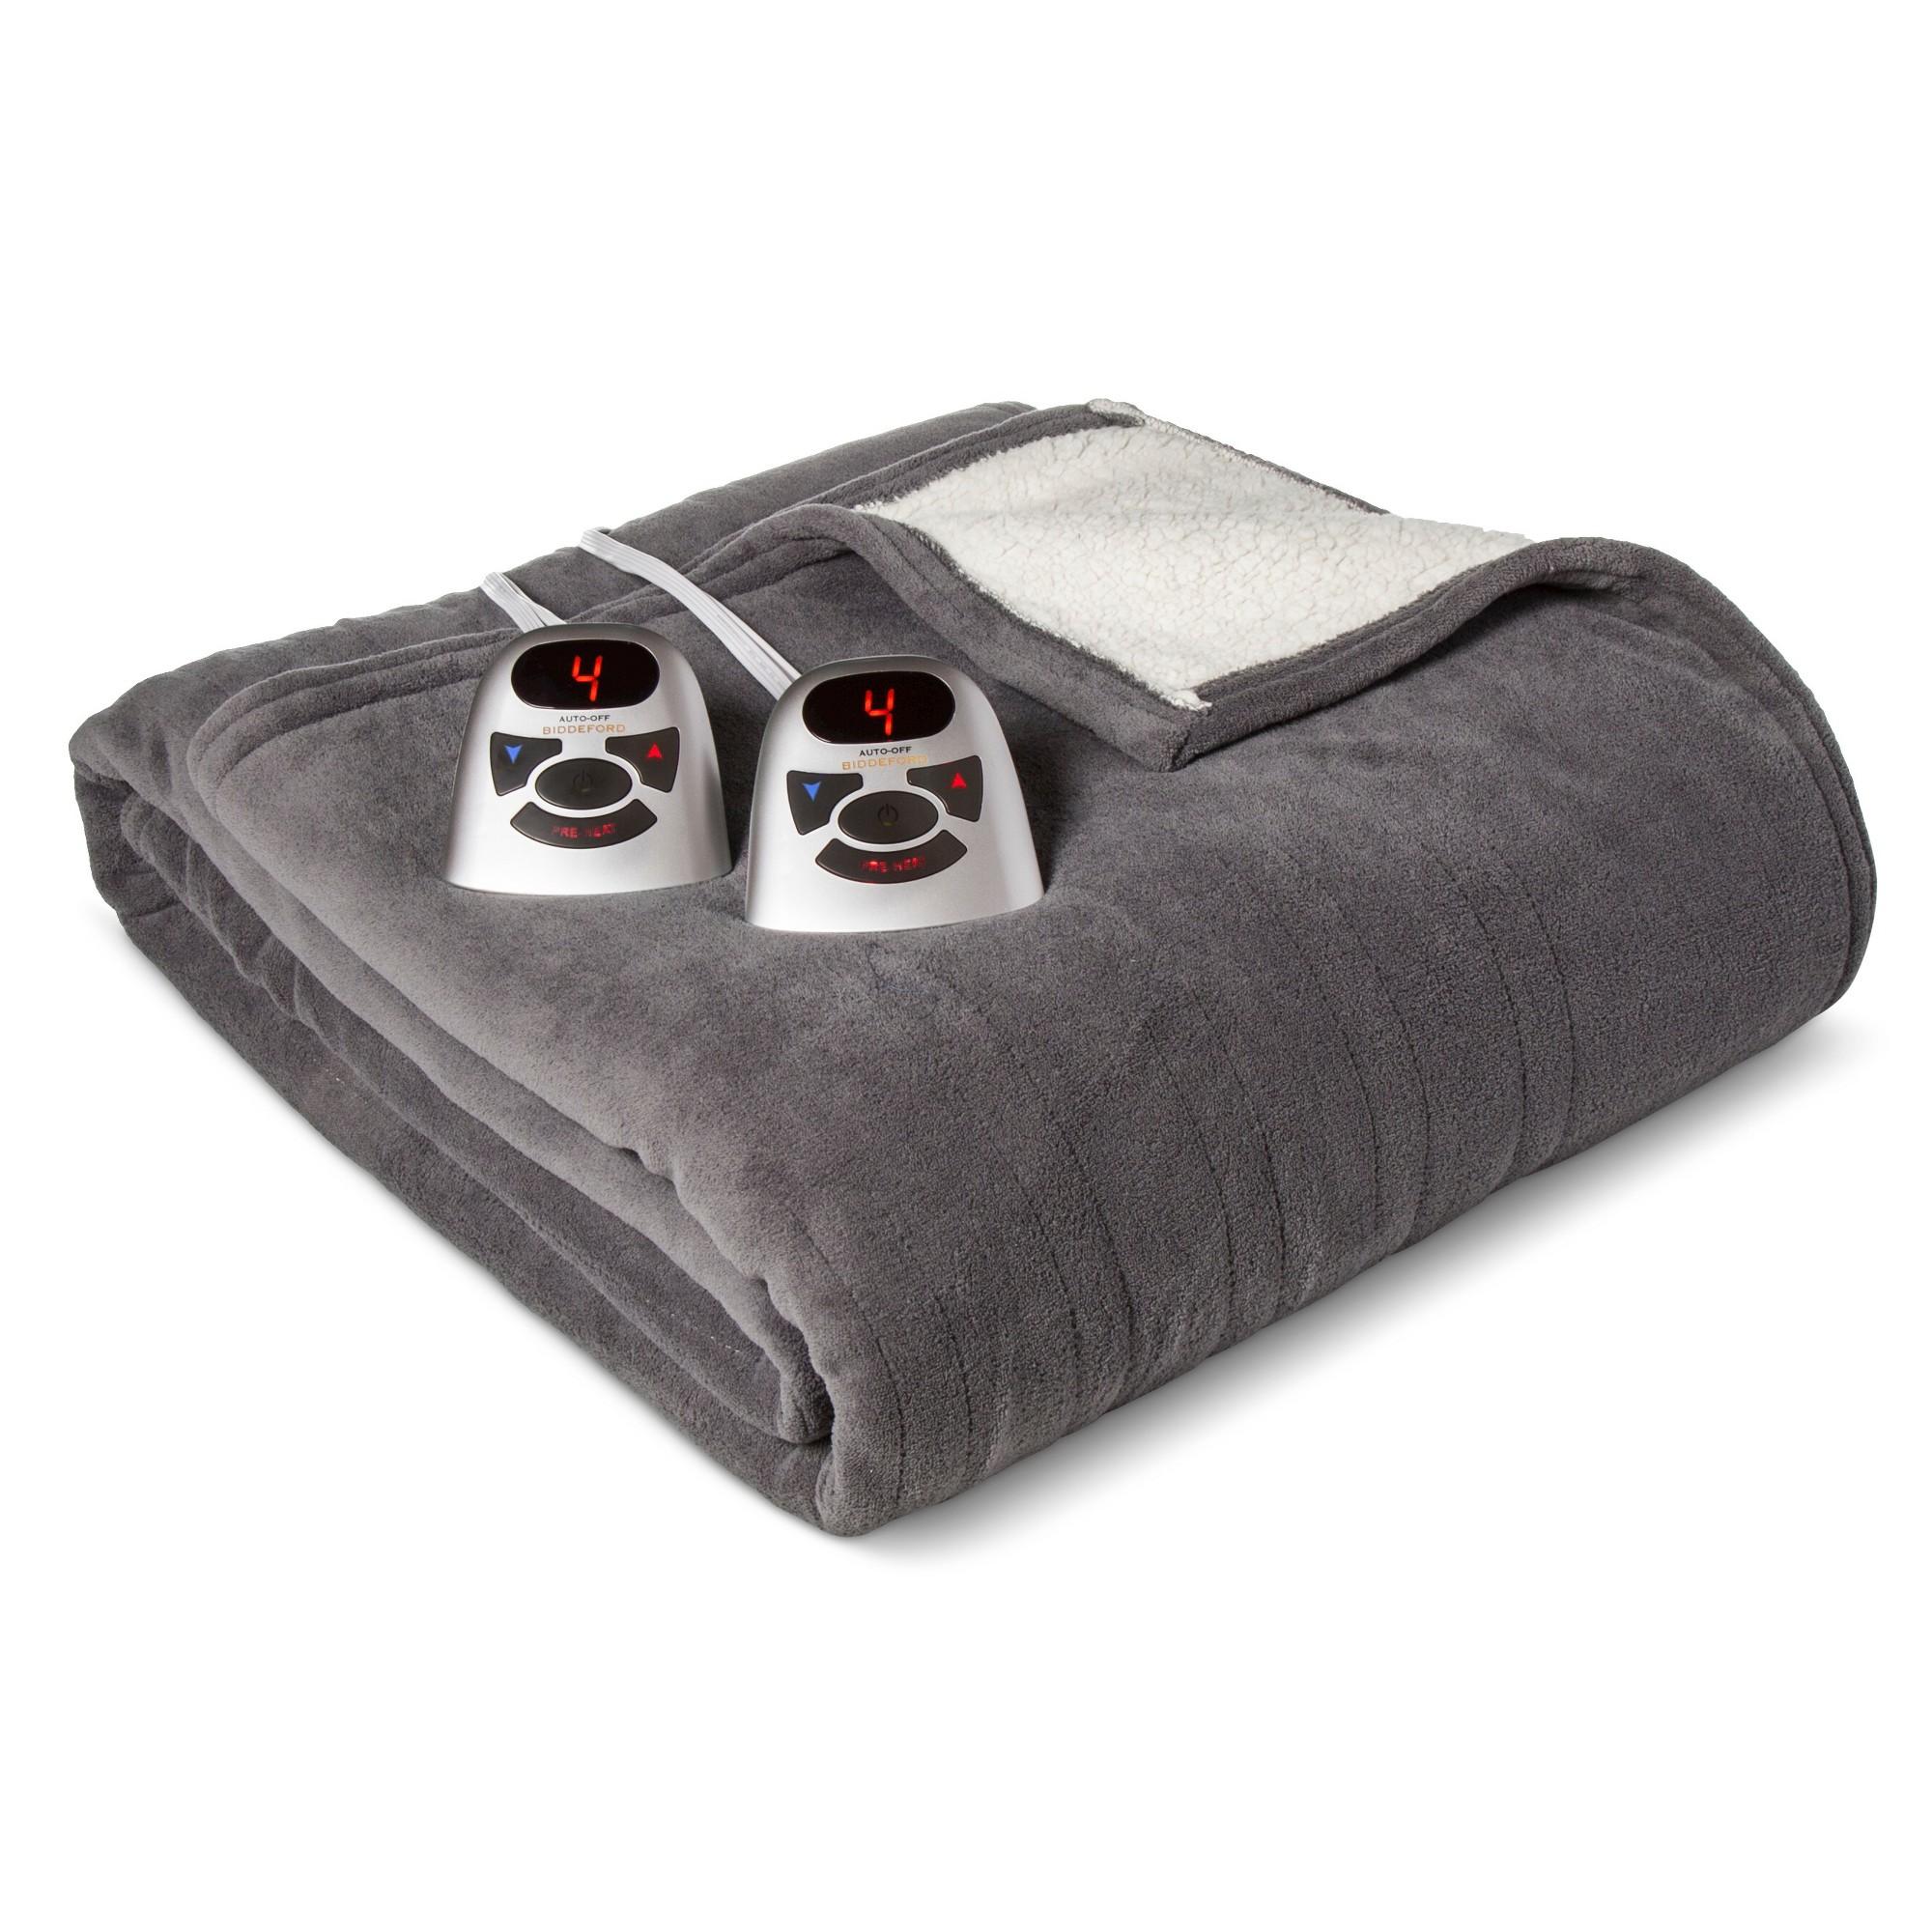 Electric Heated Microplush with Sherpa Blanket Full Gray - Biddeford